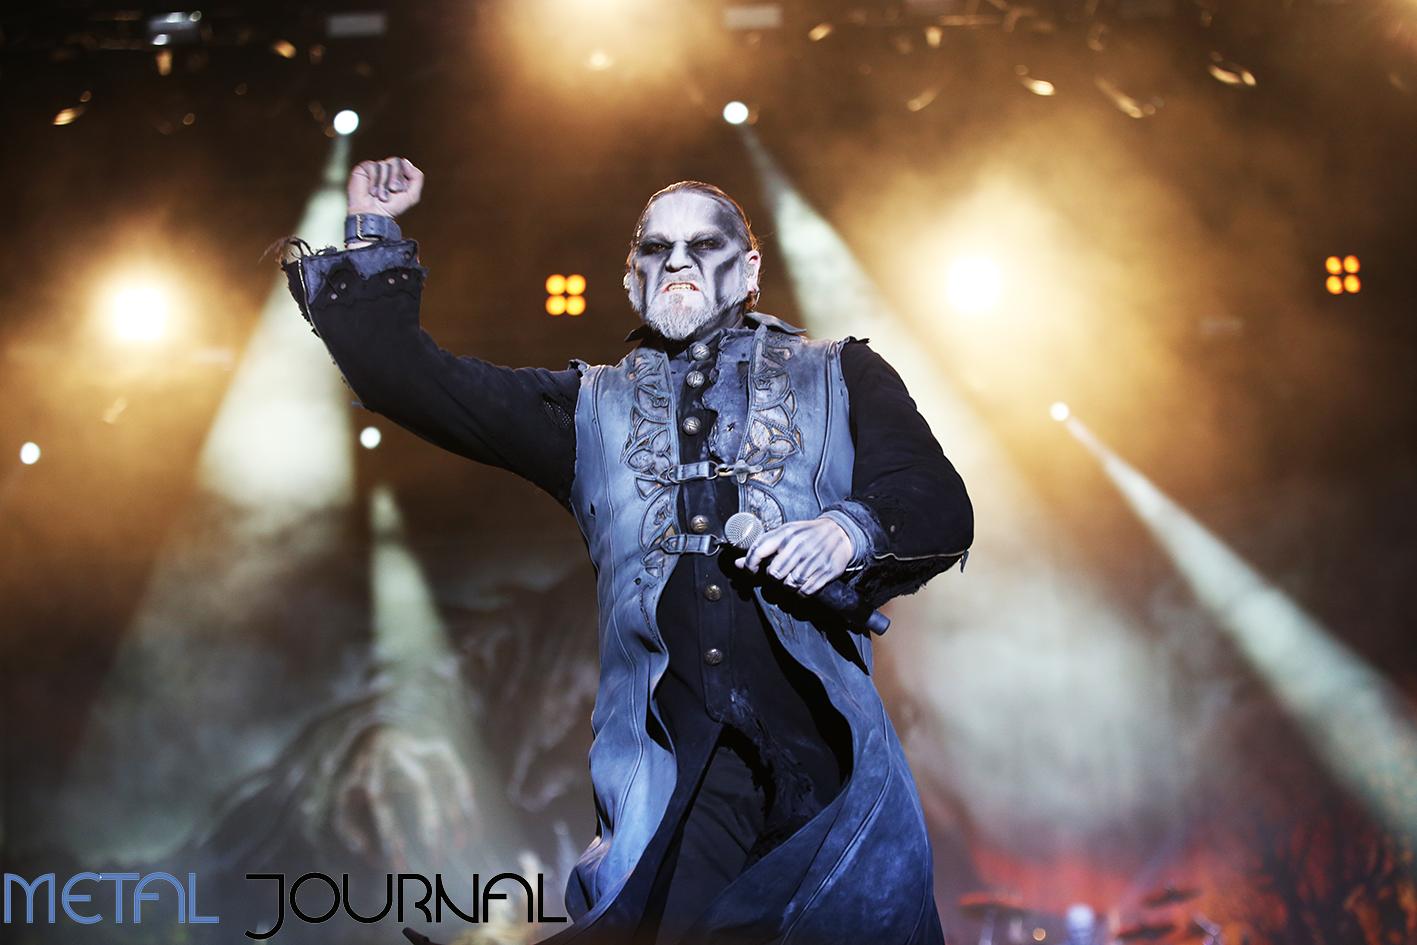 powerwolf - metal journal rock fest barcelona 2019 pic 4